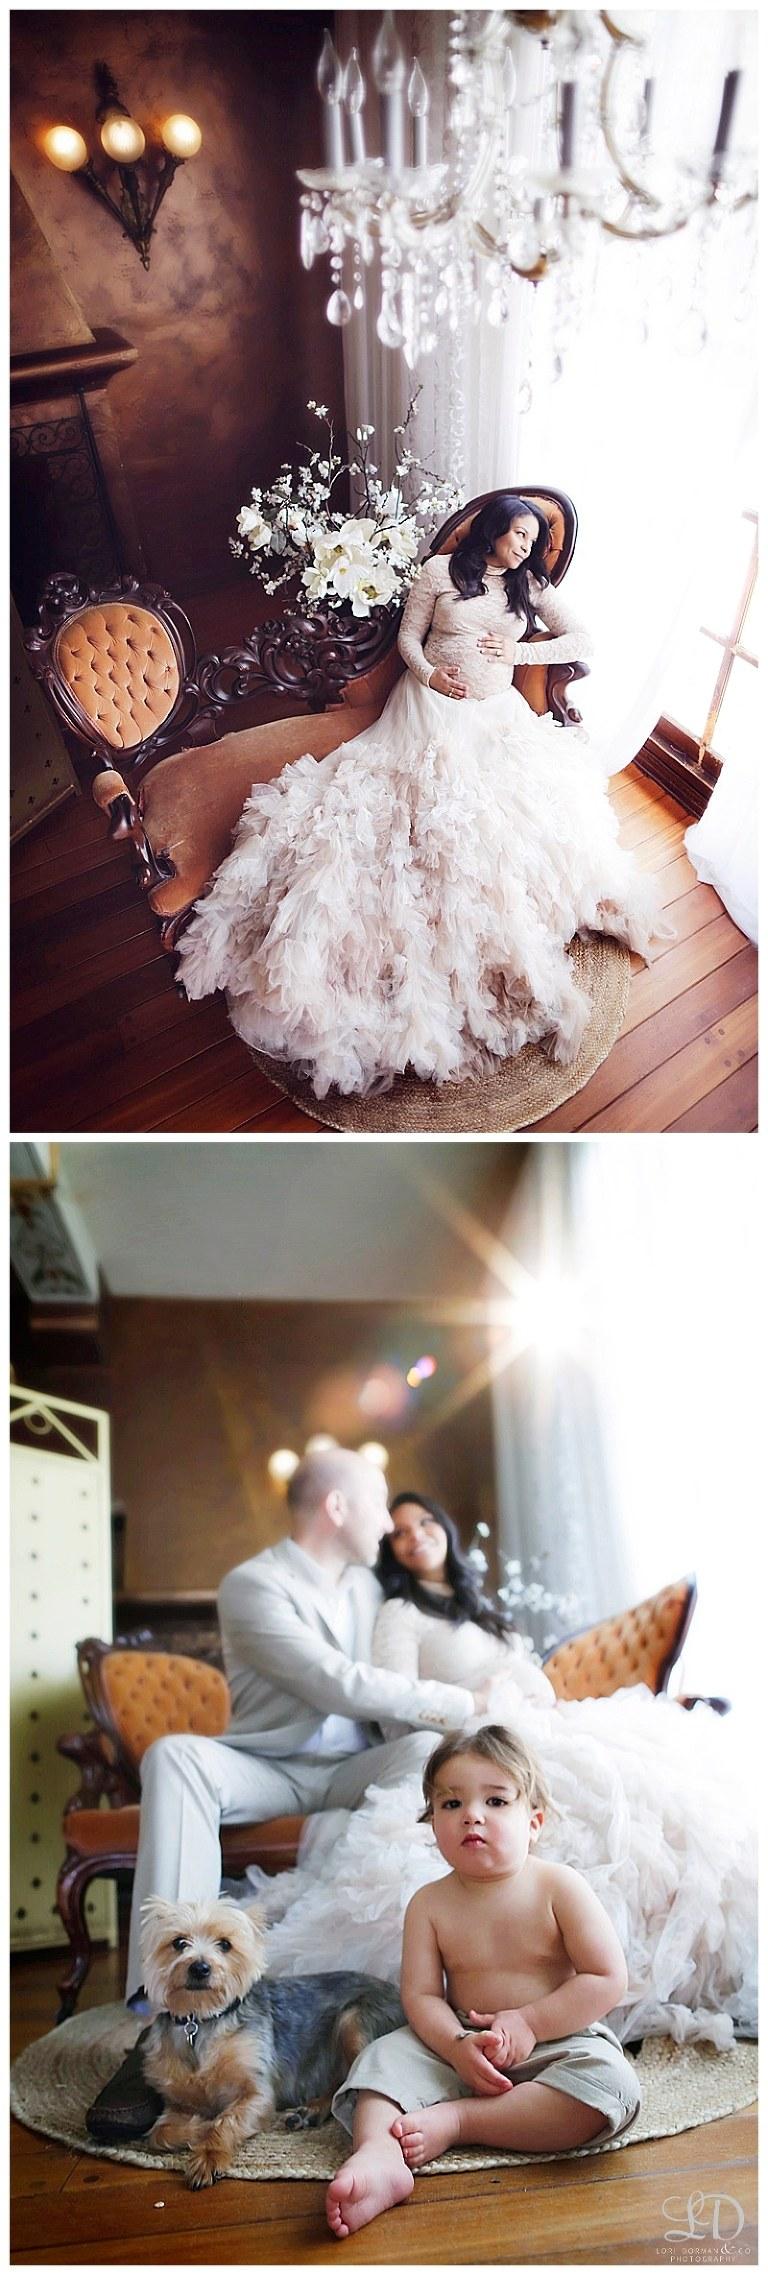 sweet maternity photoshoot-lori dorman photography-maternity boudoir-professional photographer_5185.jpg